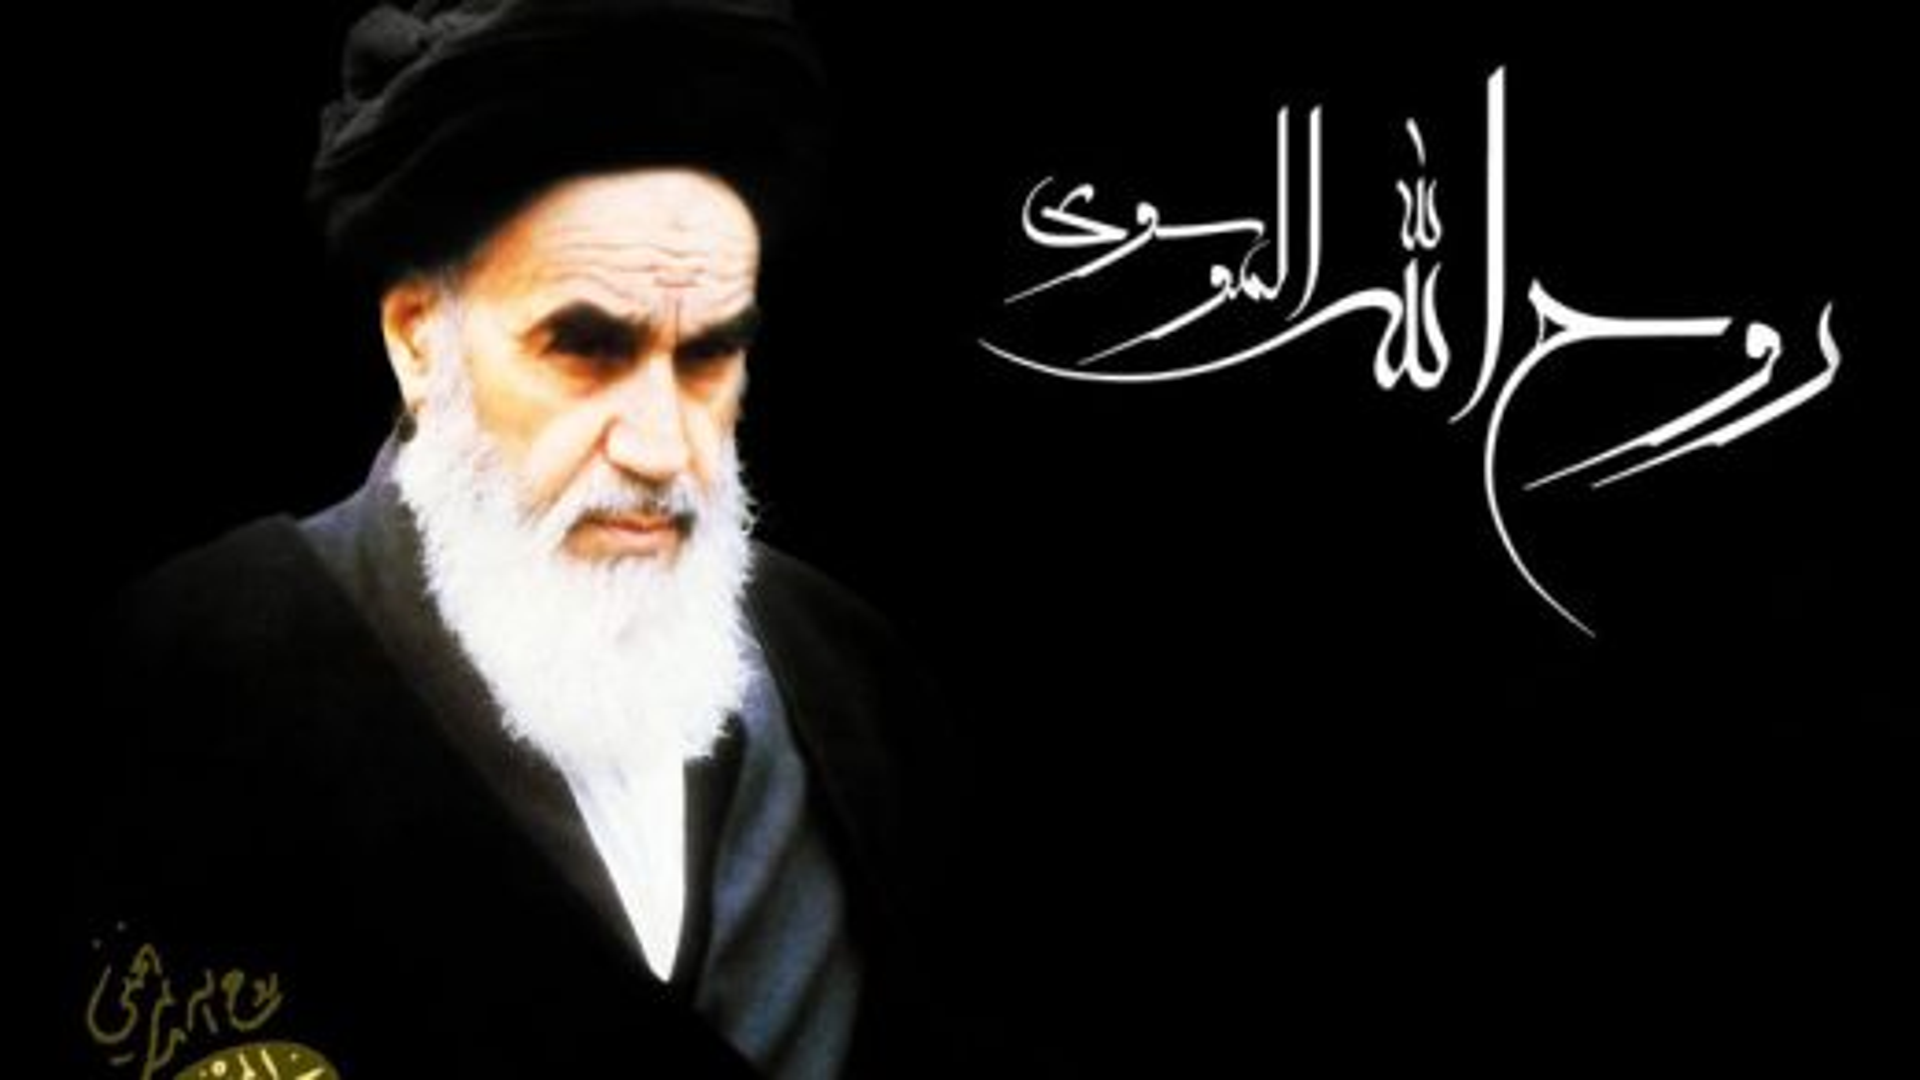 امام خمینی(ره) | تگ